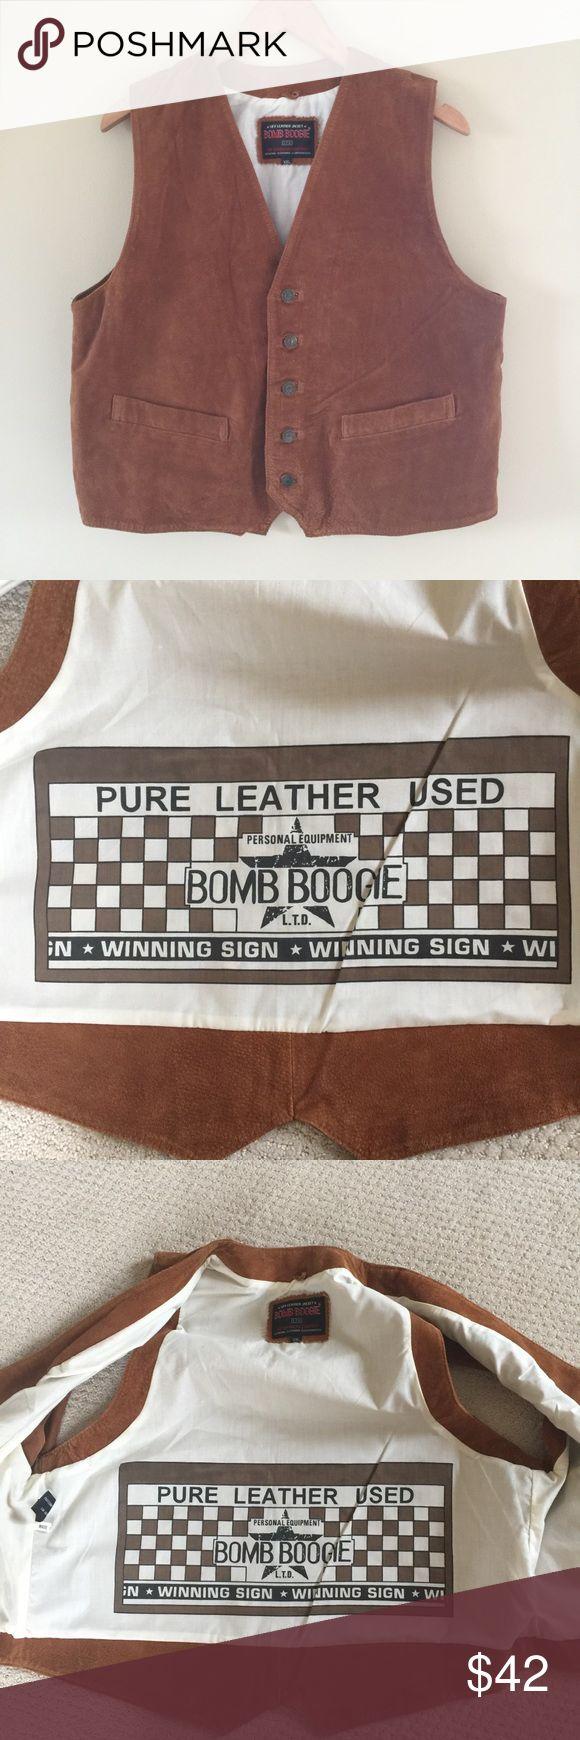 "Bomb Boogie Vintage 100% Leather Vest 100% leather vest, men's size XXL. Please do measure before purchasing; this is vintage so size runs small!!!   Armpit to armpit: 22""  Armpit to bottom: 13"" Bomb Boogie Jackets & Coats Vests"